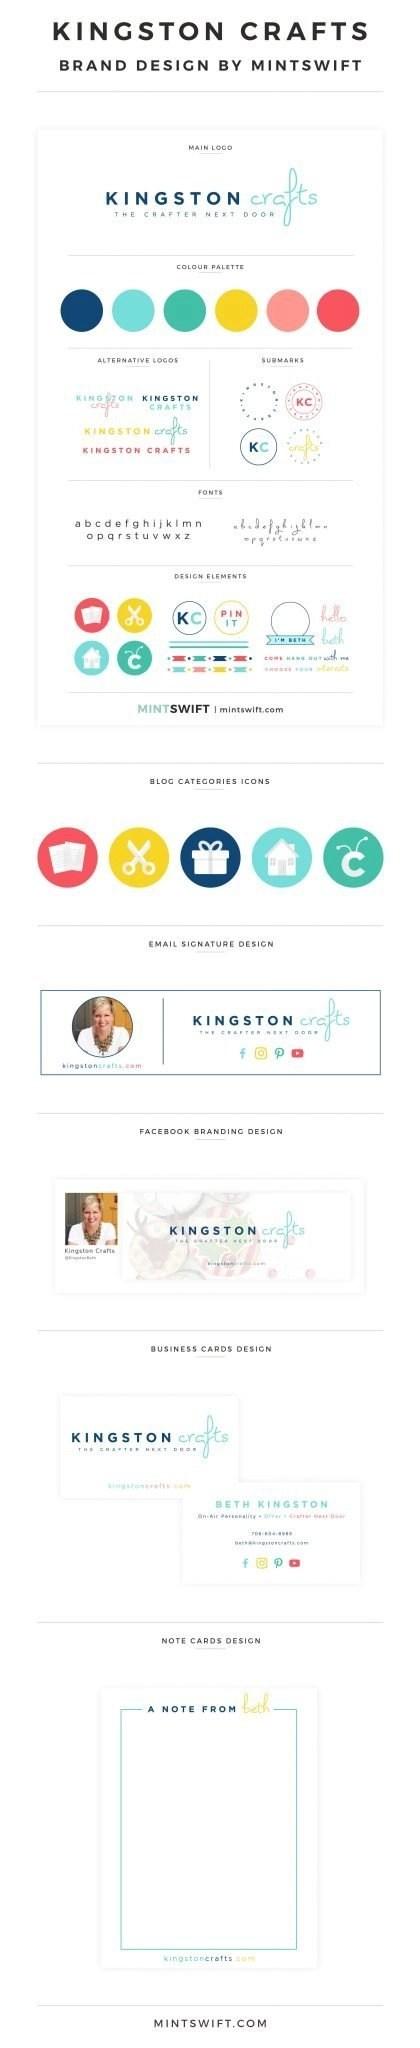 Kingston Crafts- Brand Design - MintSwift